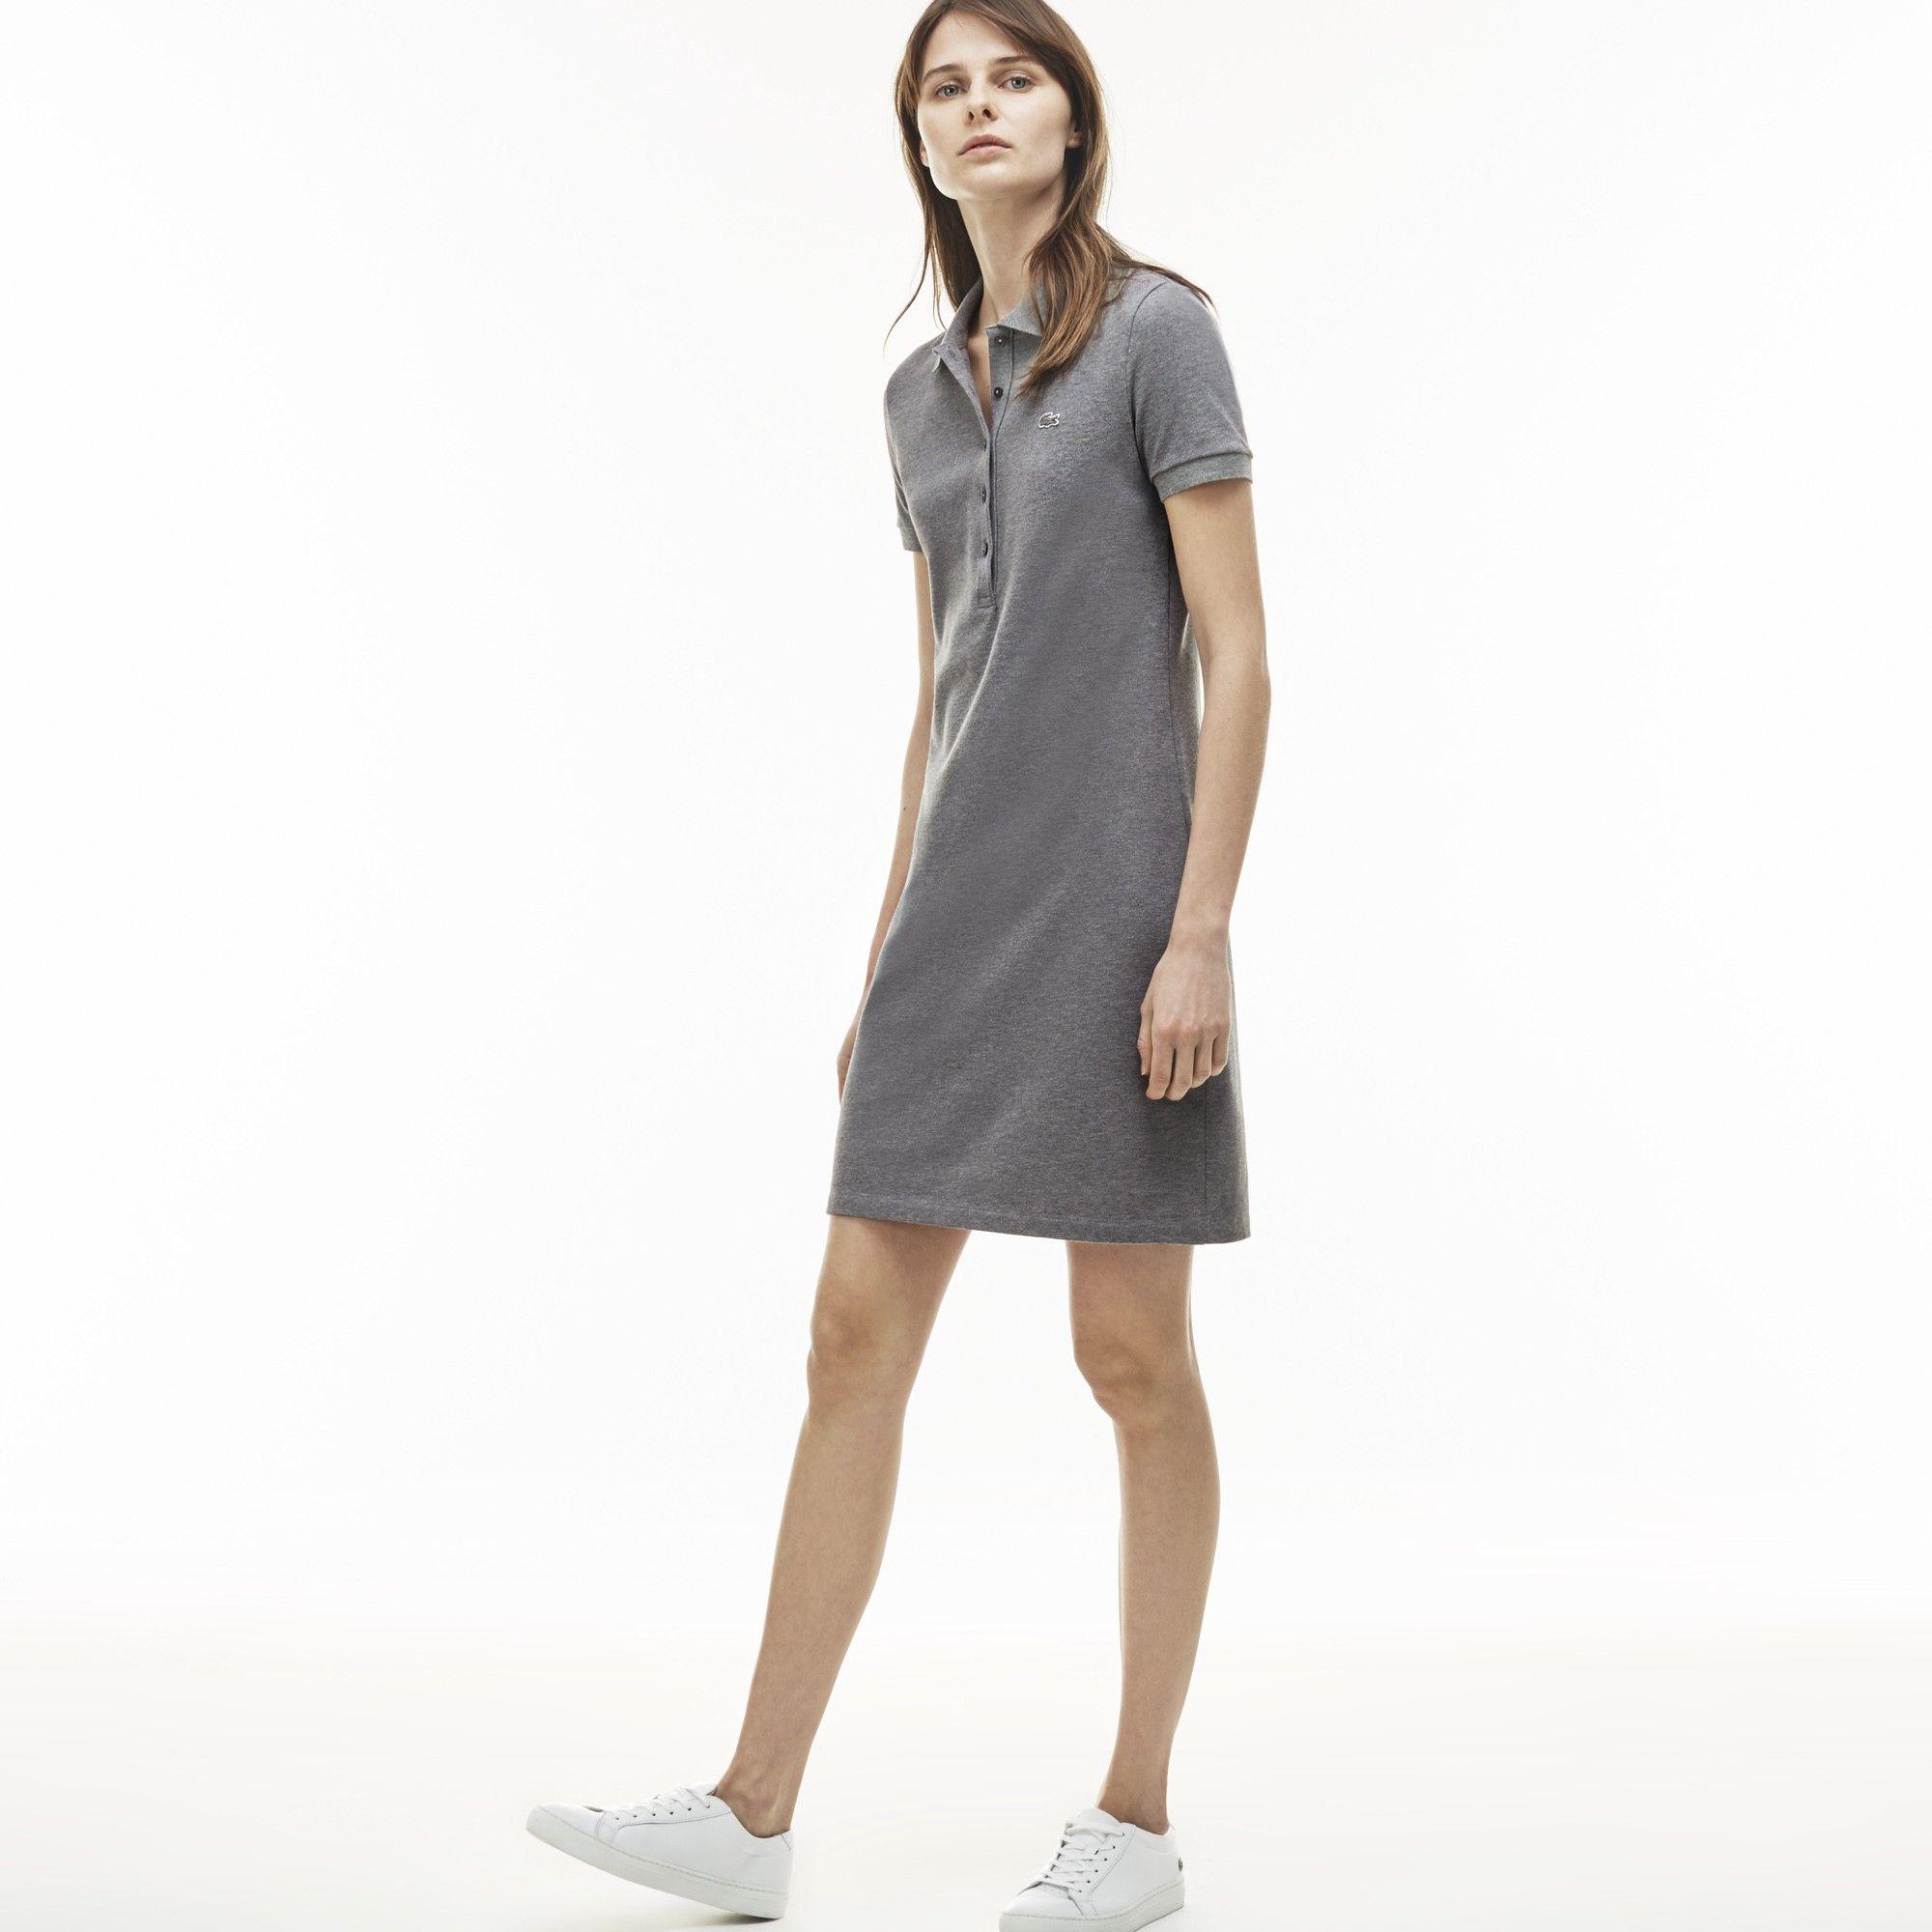 c4bb15c2ef LACOSTE Women's Stretch Cotton Mini Piqué Polo Dress - galaxite ...